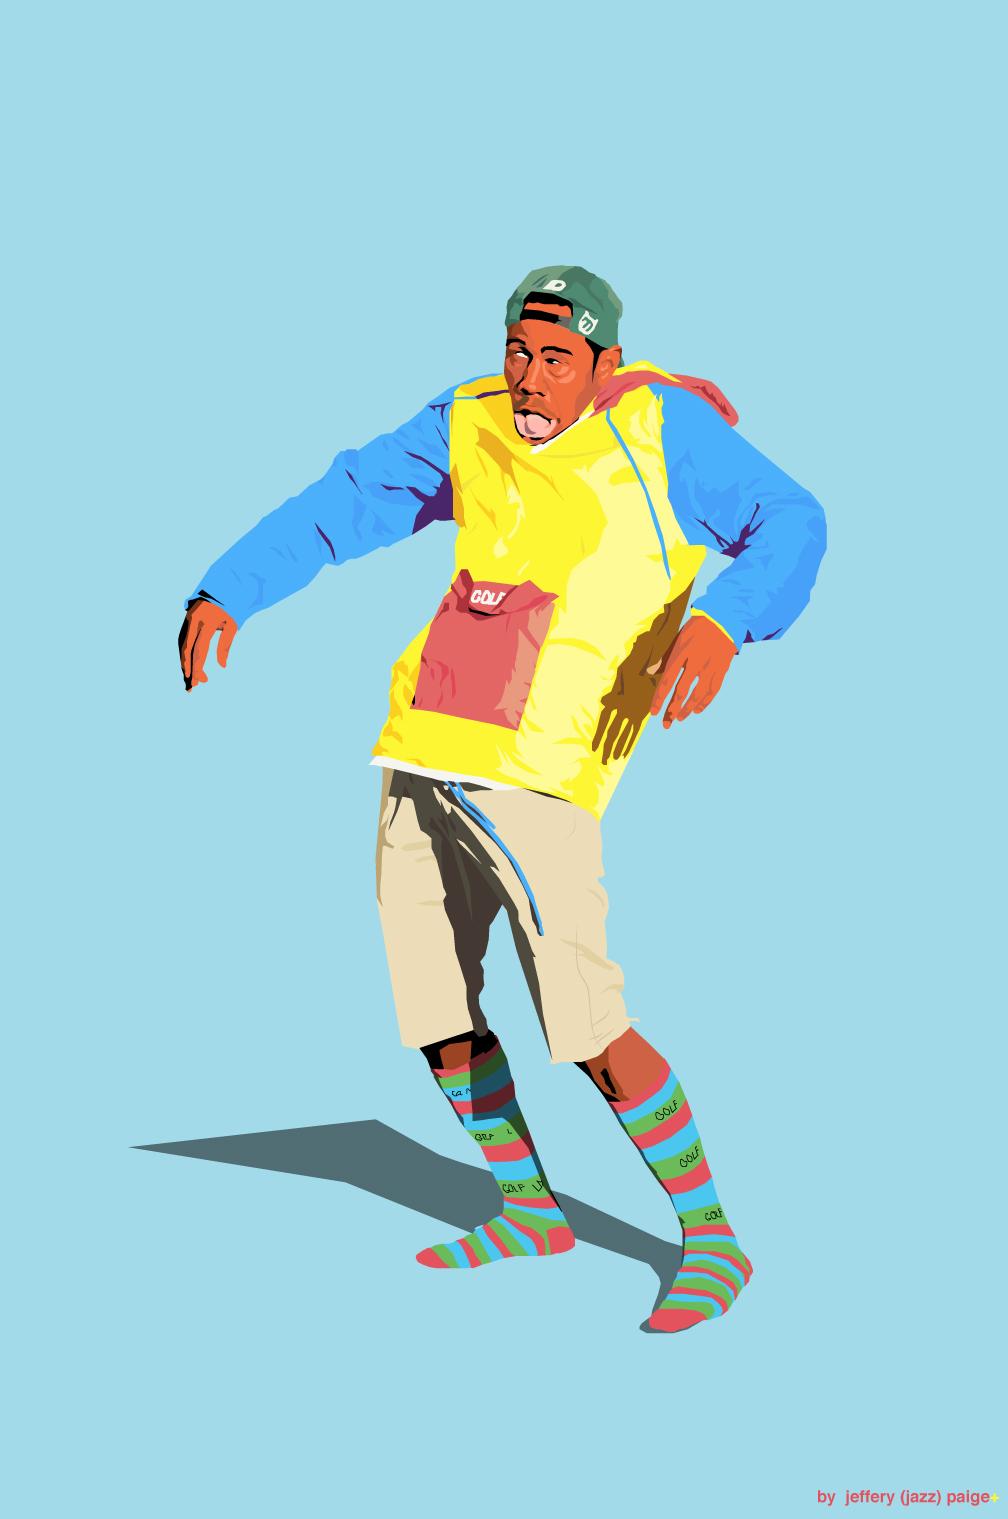 Stussy Hd Wallpaper Tyler The Creator Golf Wang Clothing On Behance